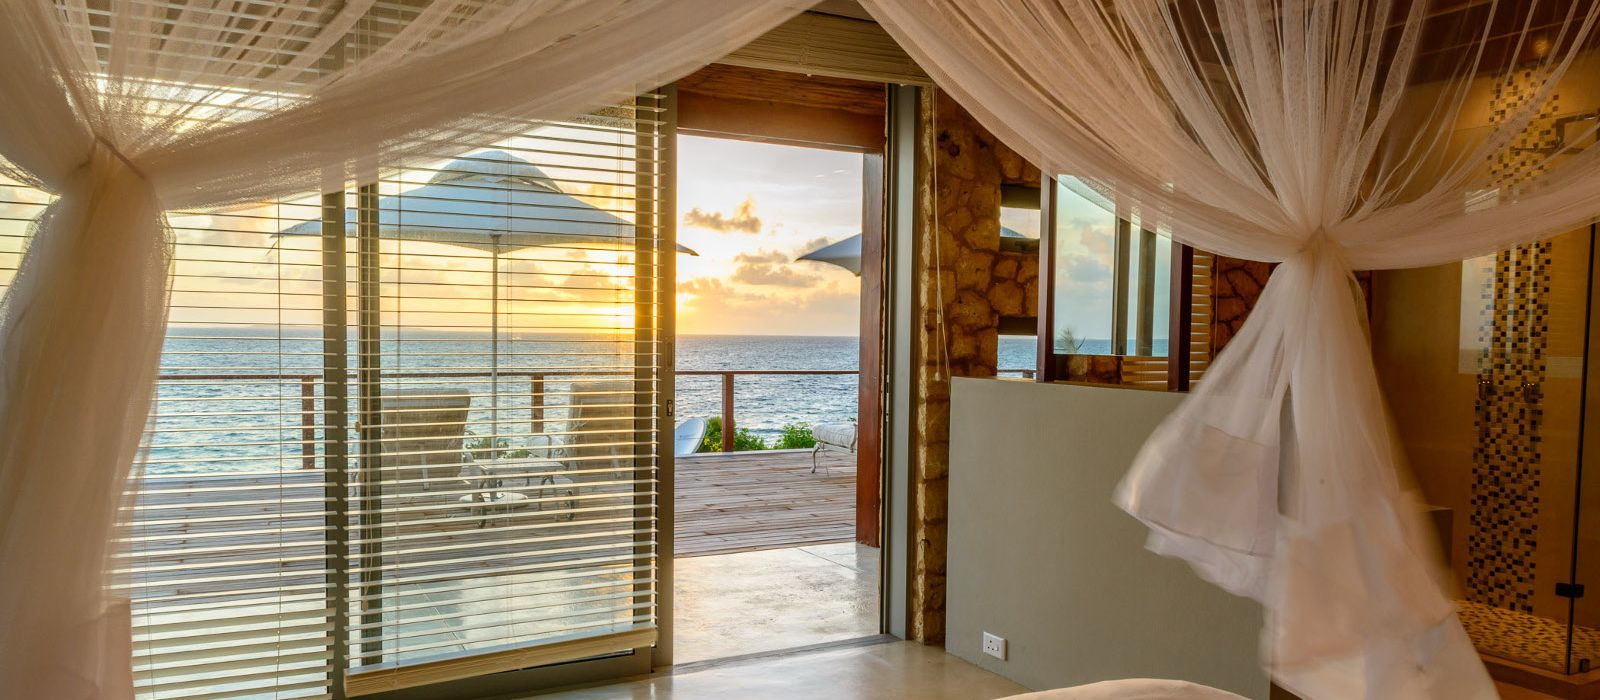 Hotel Bahia Mar Boutique  Mozambique